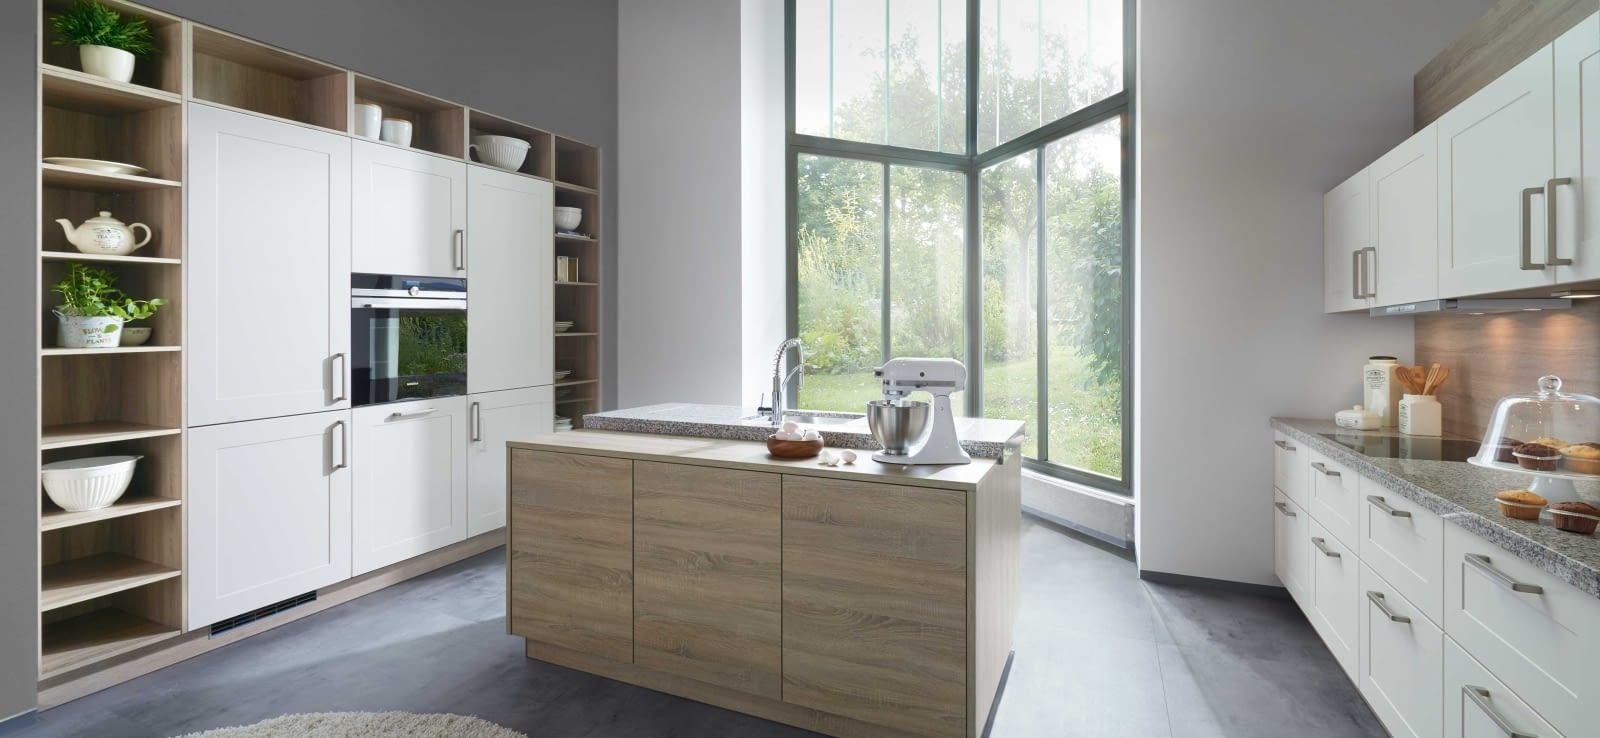 landhausk che inselk che venta magnolia und kansas oak mit rosa beta marquardt k chen. Black Bedroom Furniture Sets. Home Design Ideas